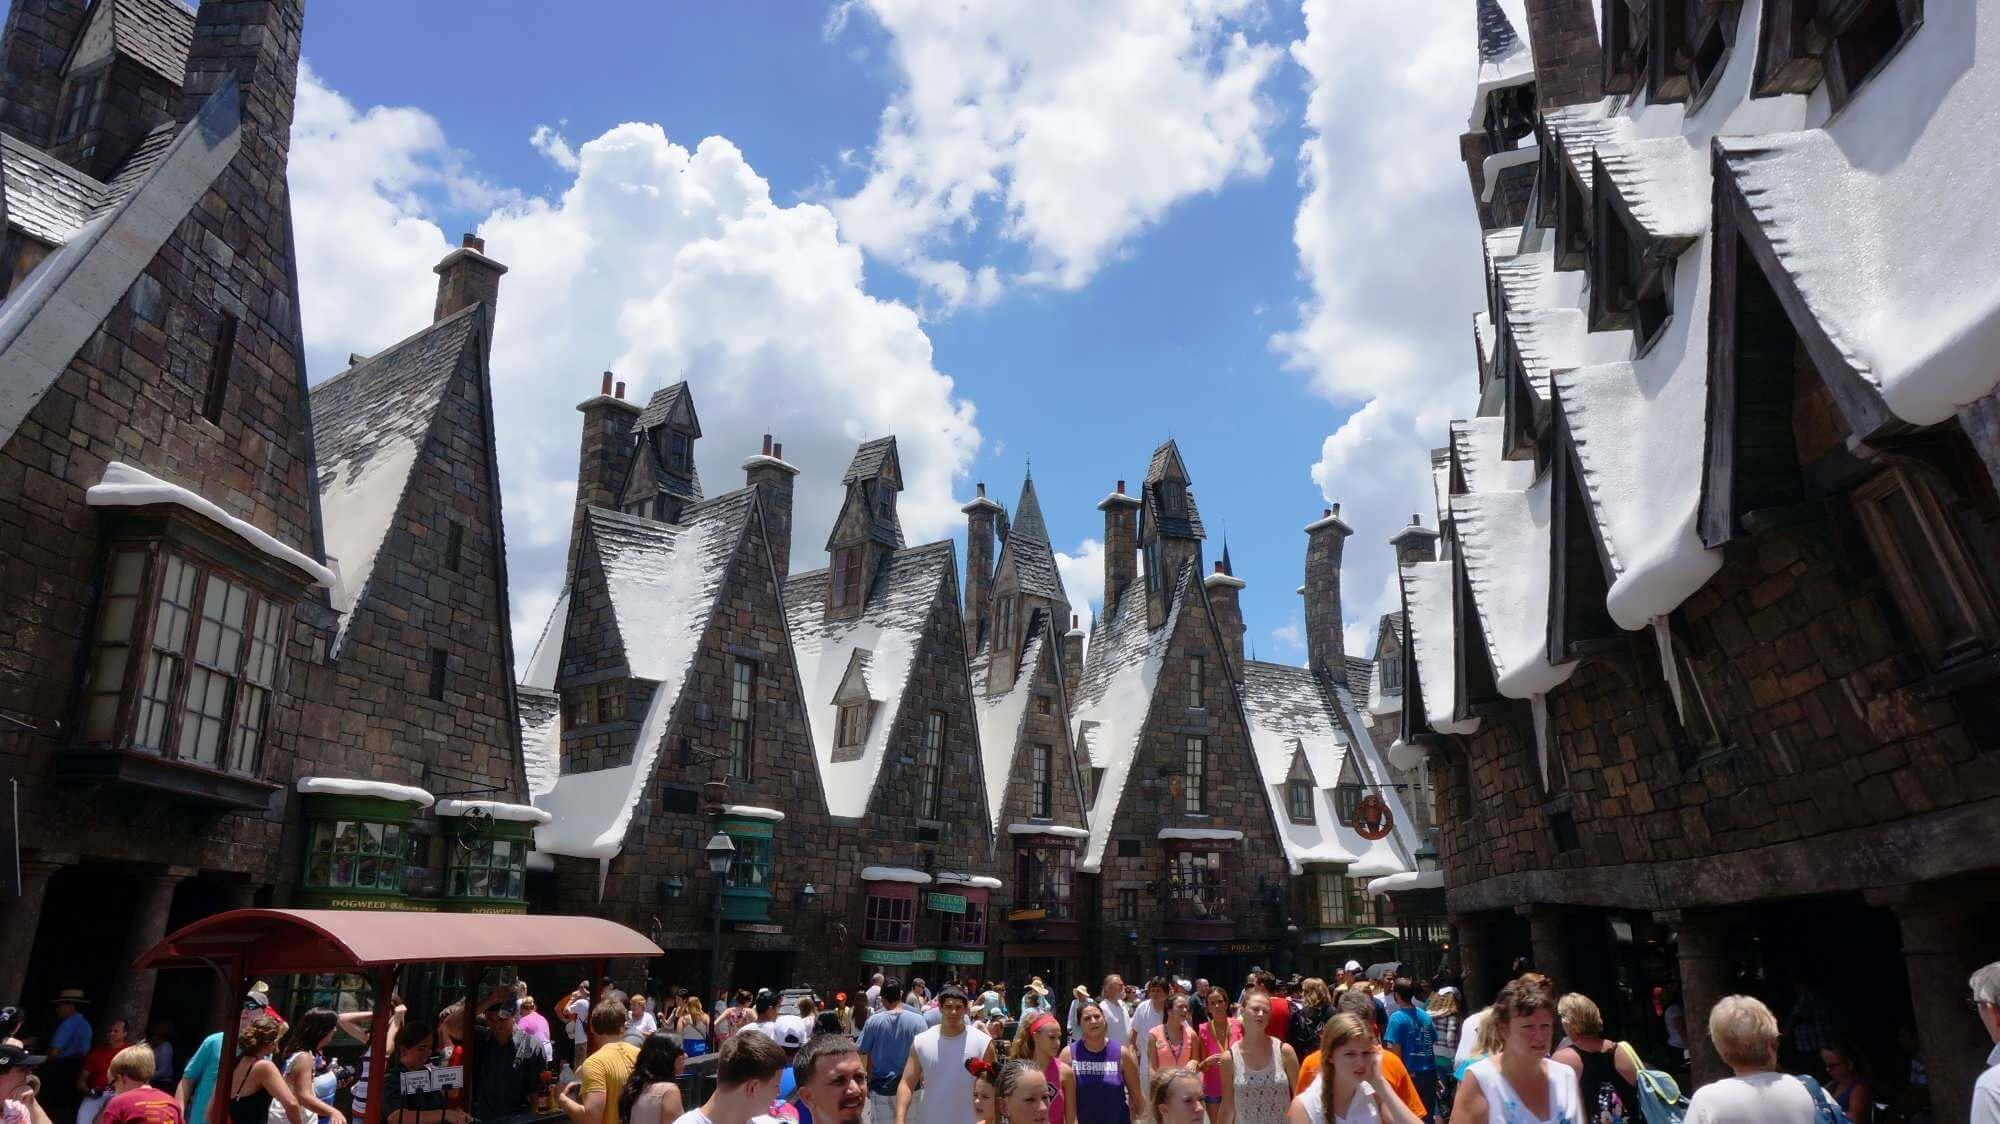 Parque Islands of Adventure Orlando: The Wizarding World of Harry Potter - Hogsmeade